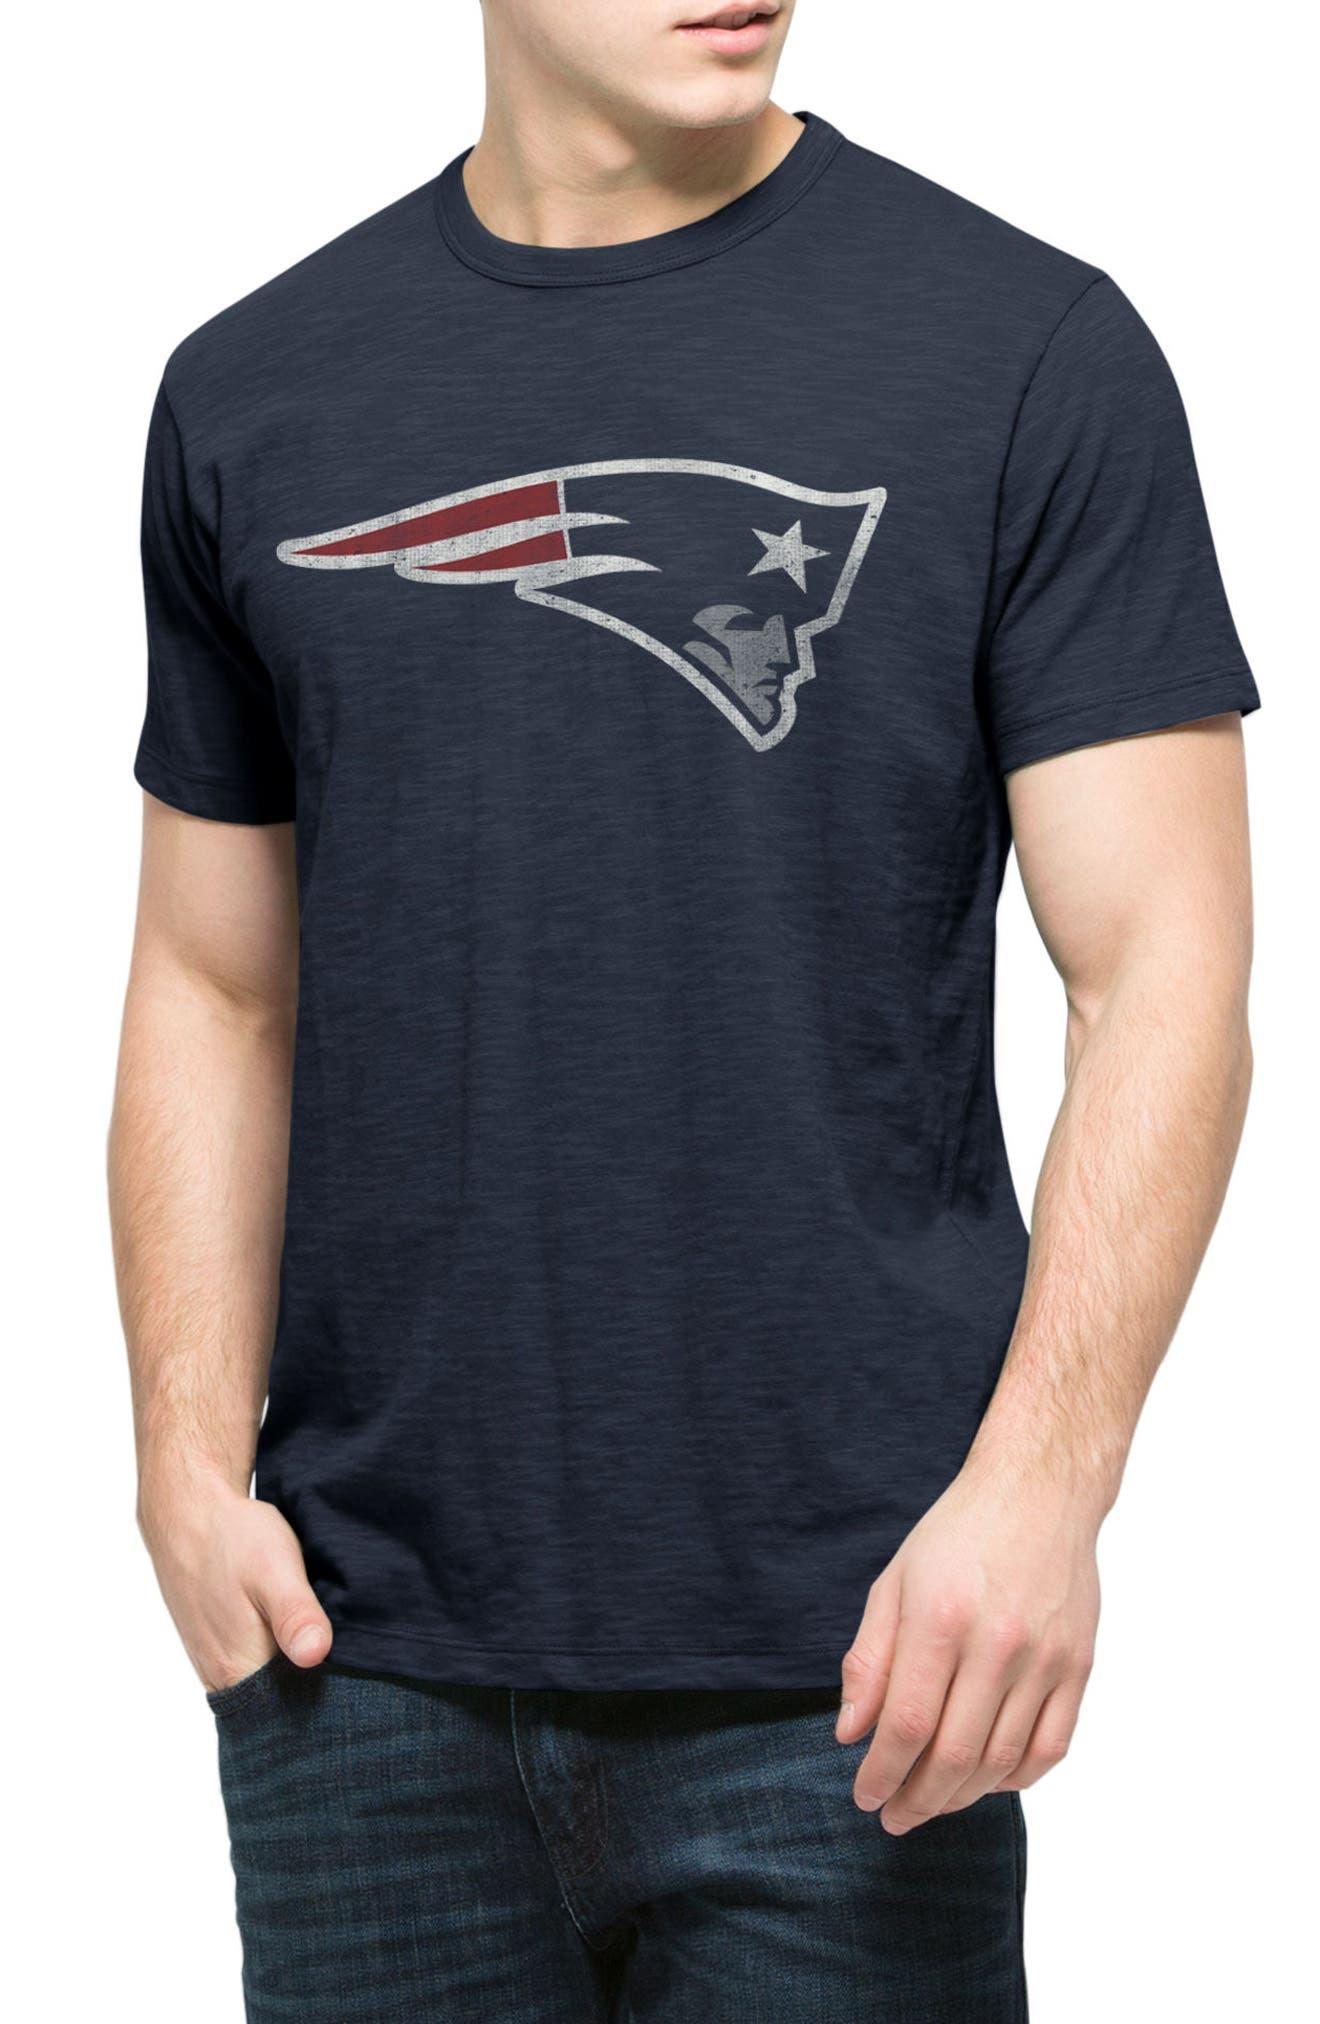 New England Patriots Scrum T-Shirt,                             Main thumbnail 1, color,                             400